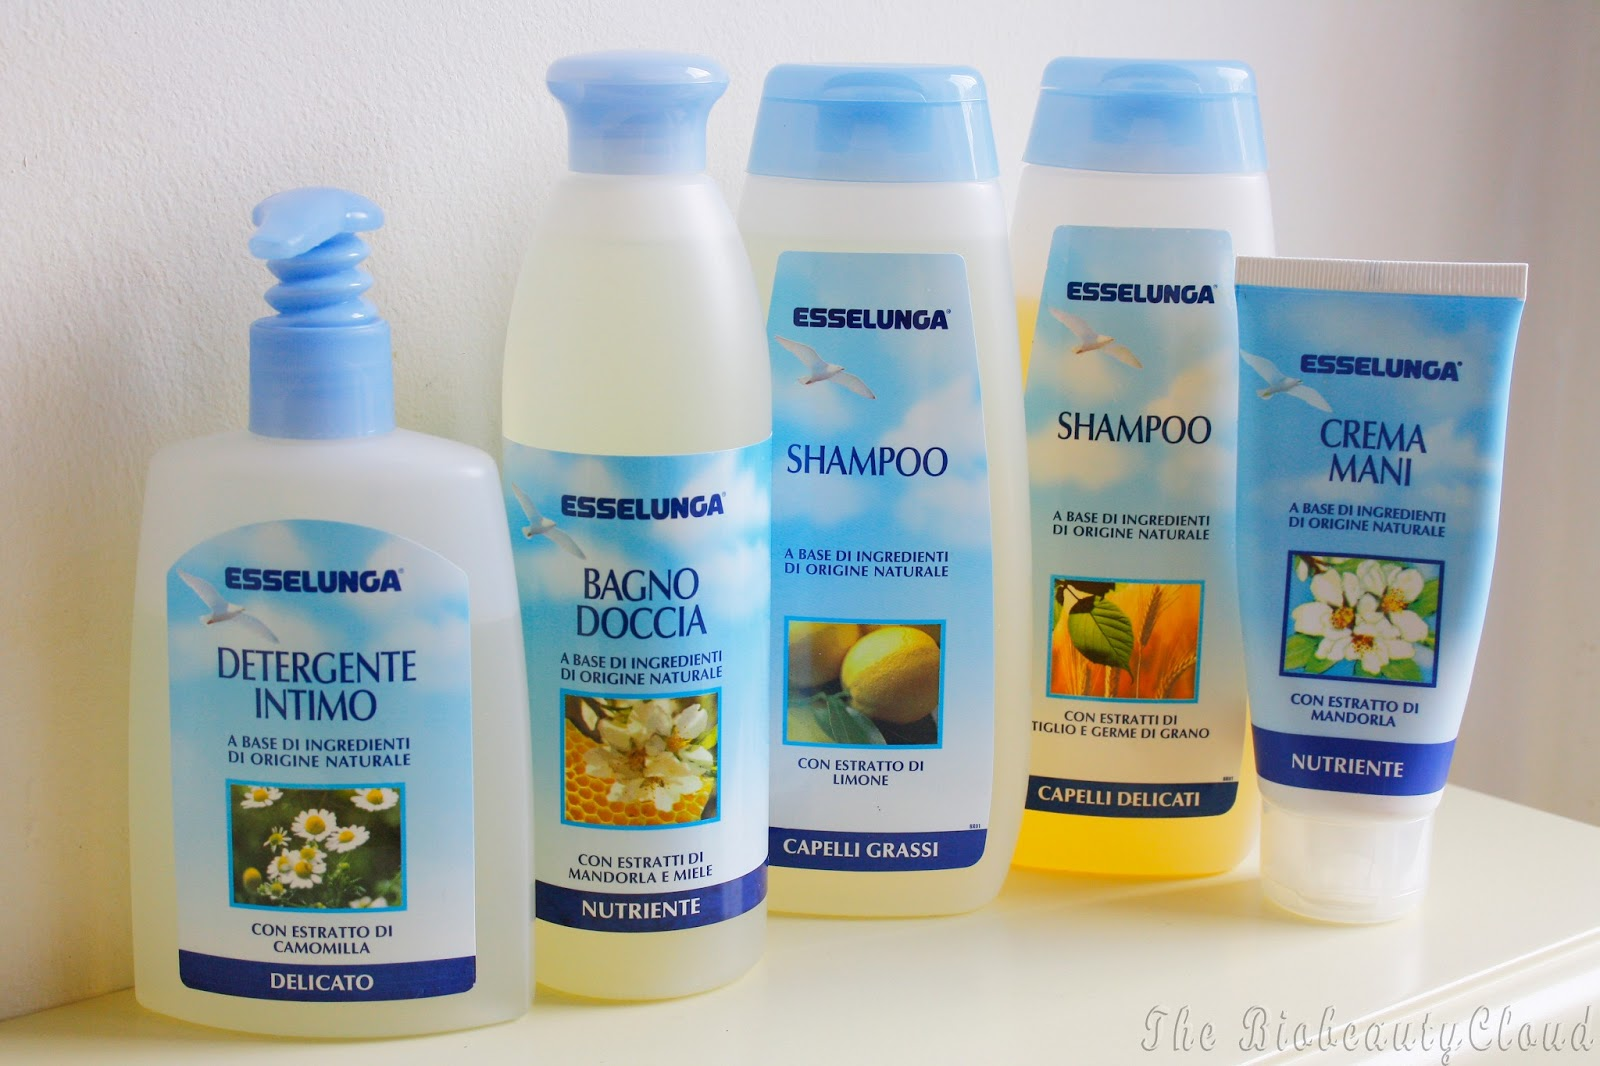 Bagnoschiuma Naturale : Bagnoschiuma fai da te naturale ricetta semplicissima